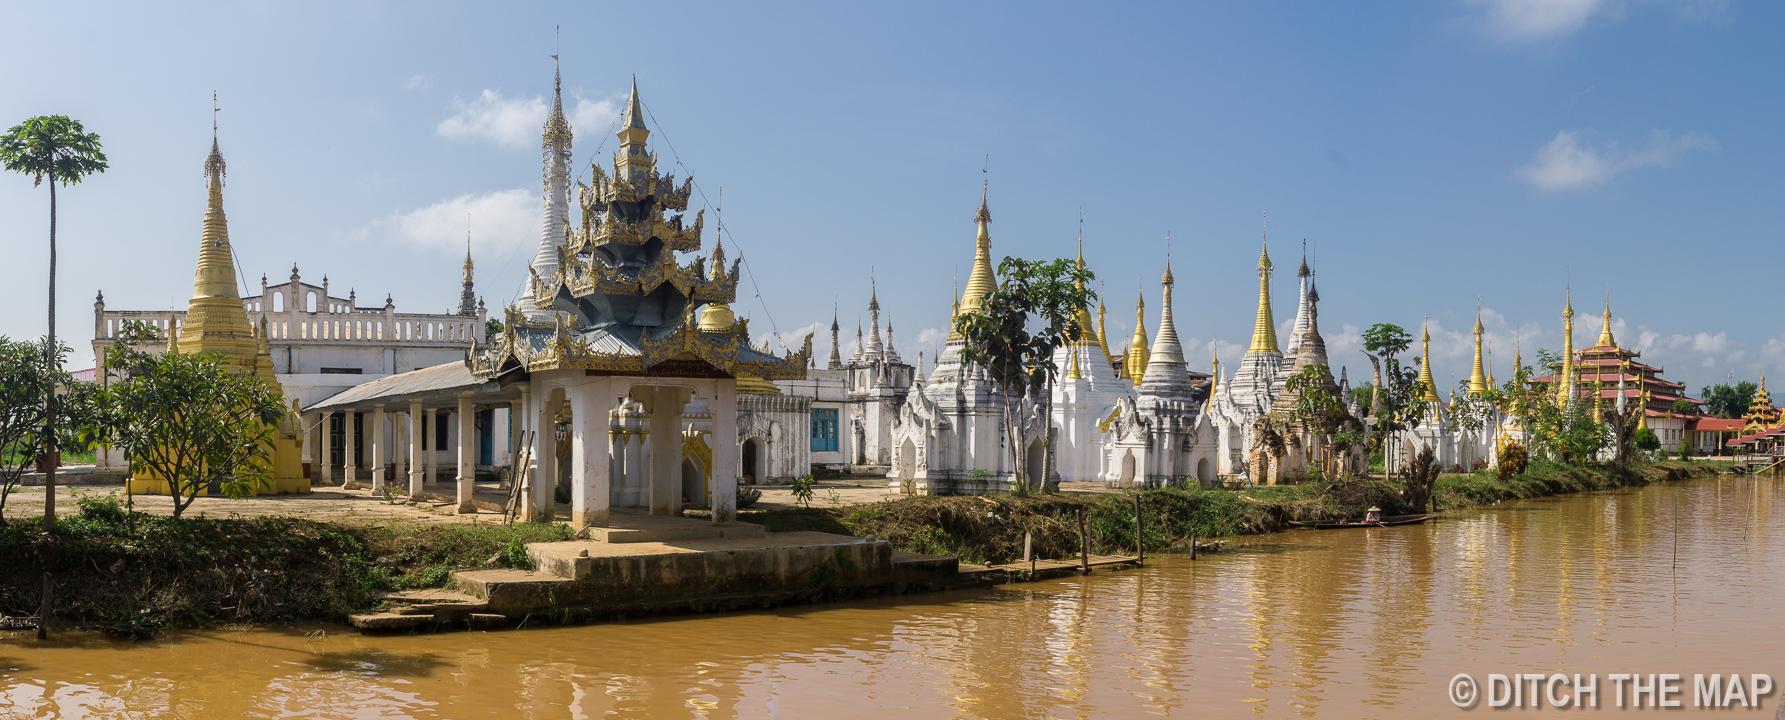 Hpaung Daw U Pagoda in Inle Lake, Myanmar